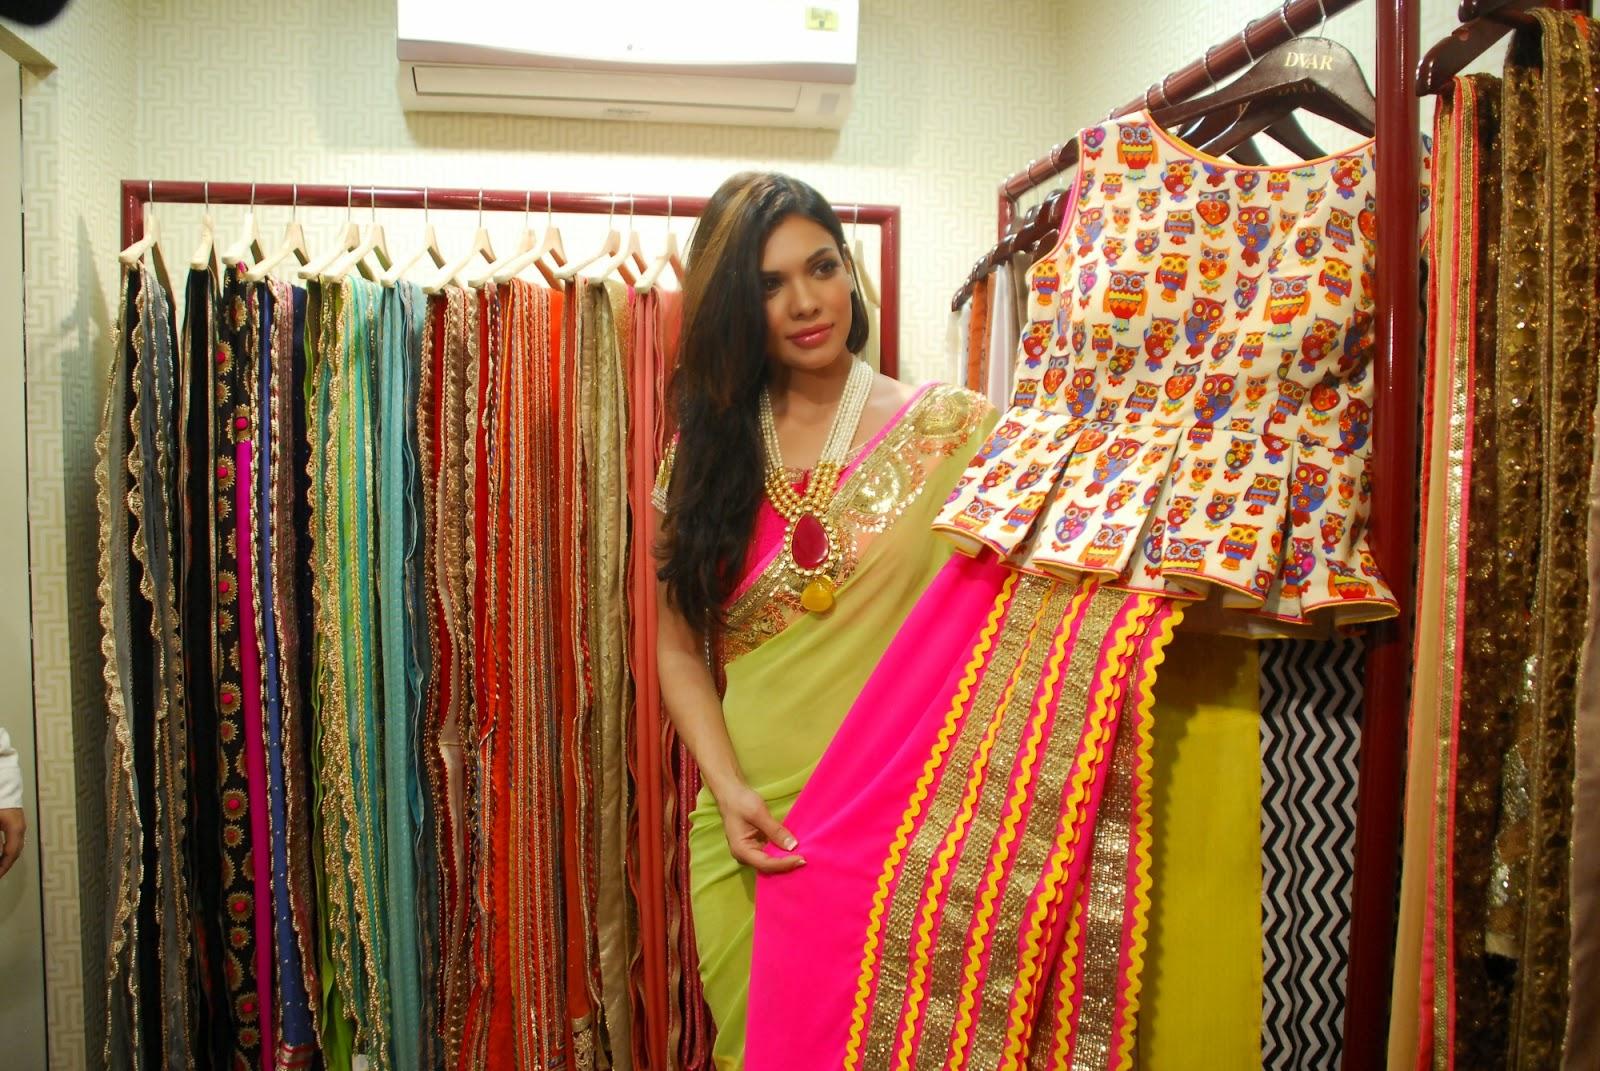 Pinky Roshan & Geeta Basra at Ushma Vaidya's debut festive collection preview